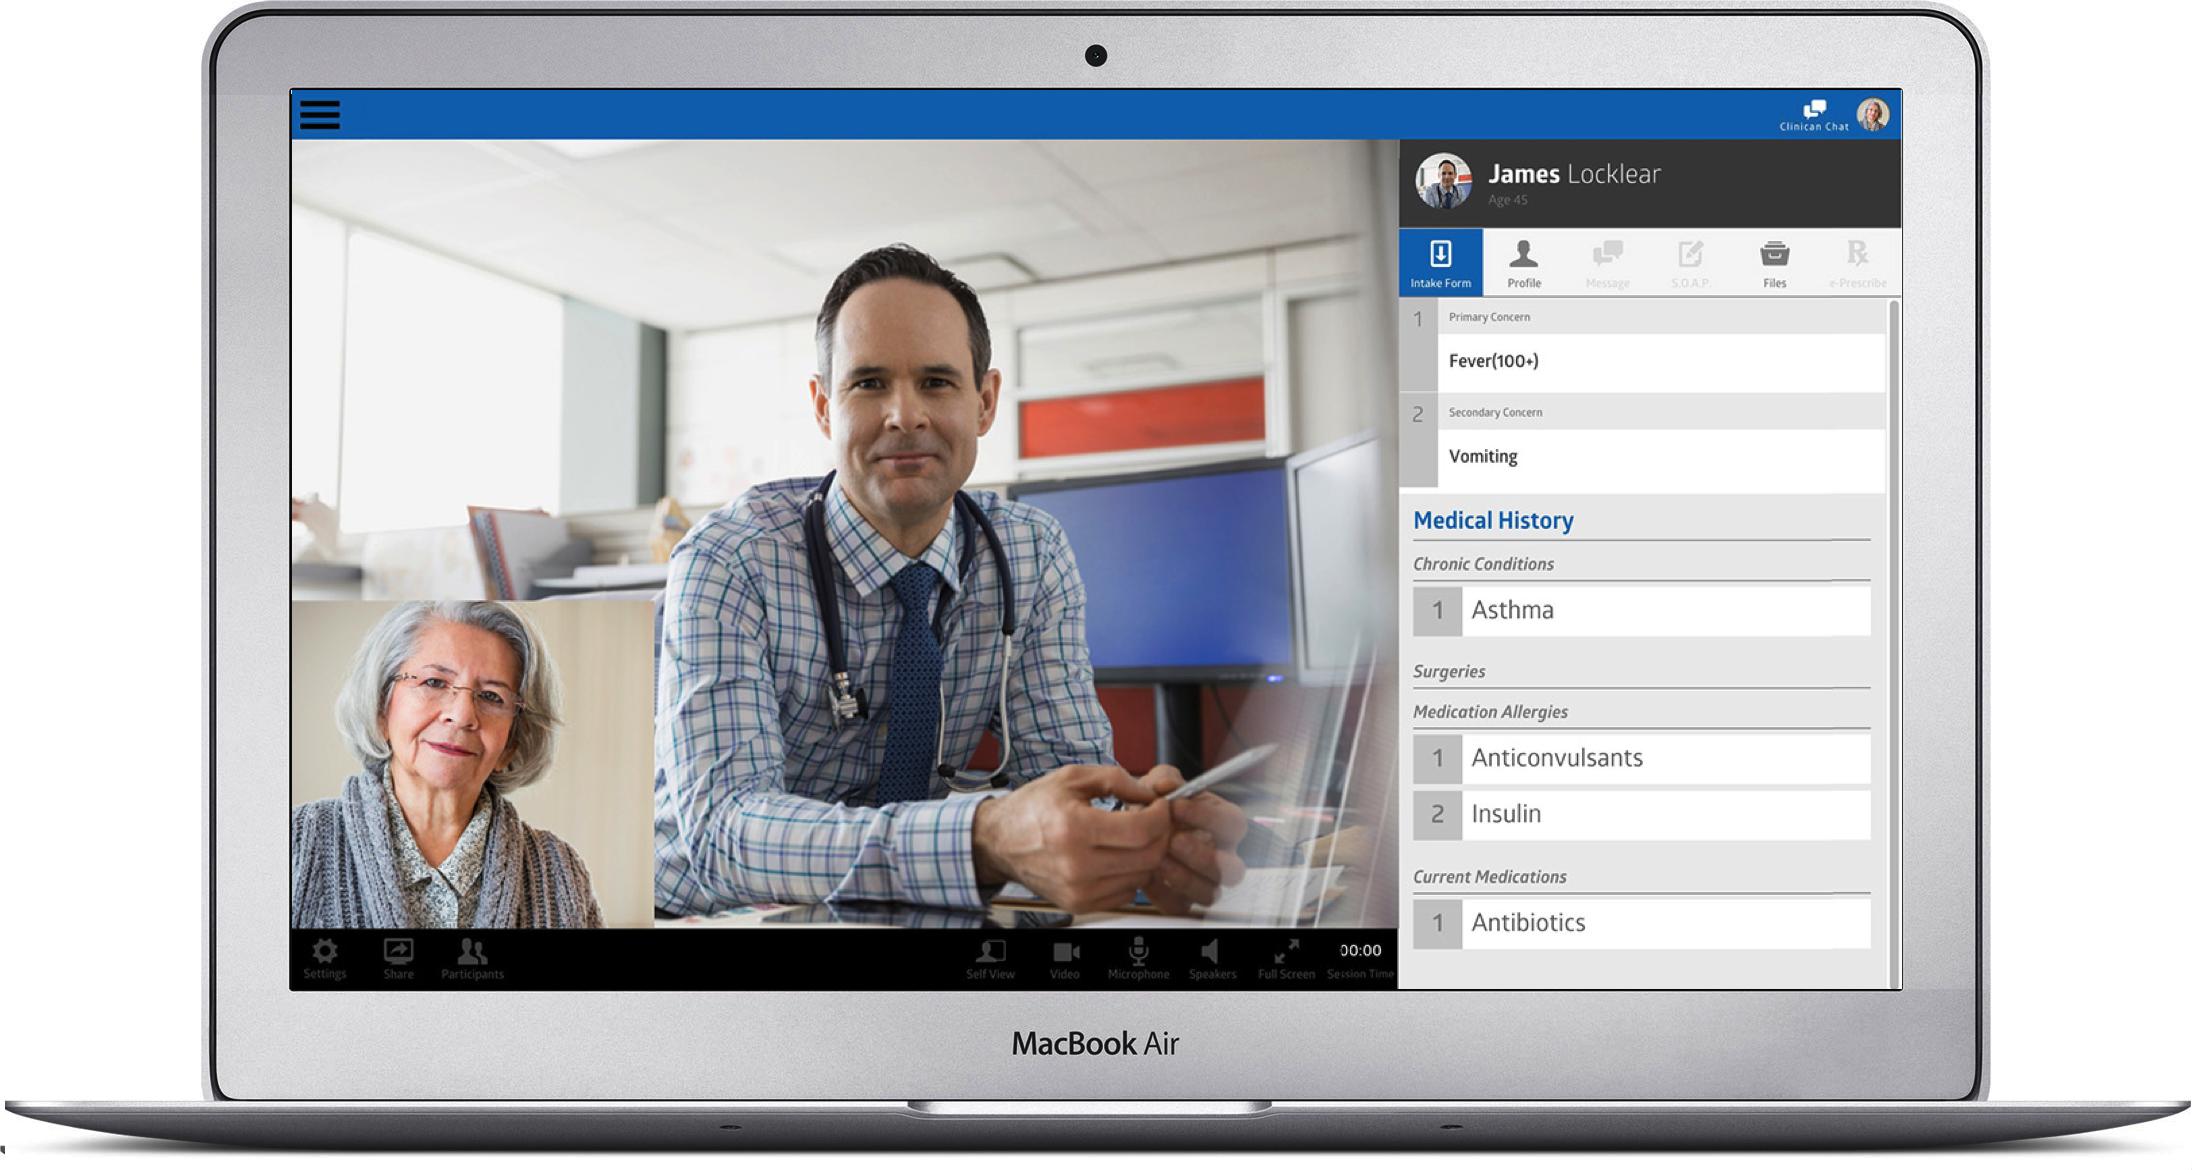 Telehealth on Macbook